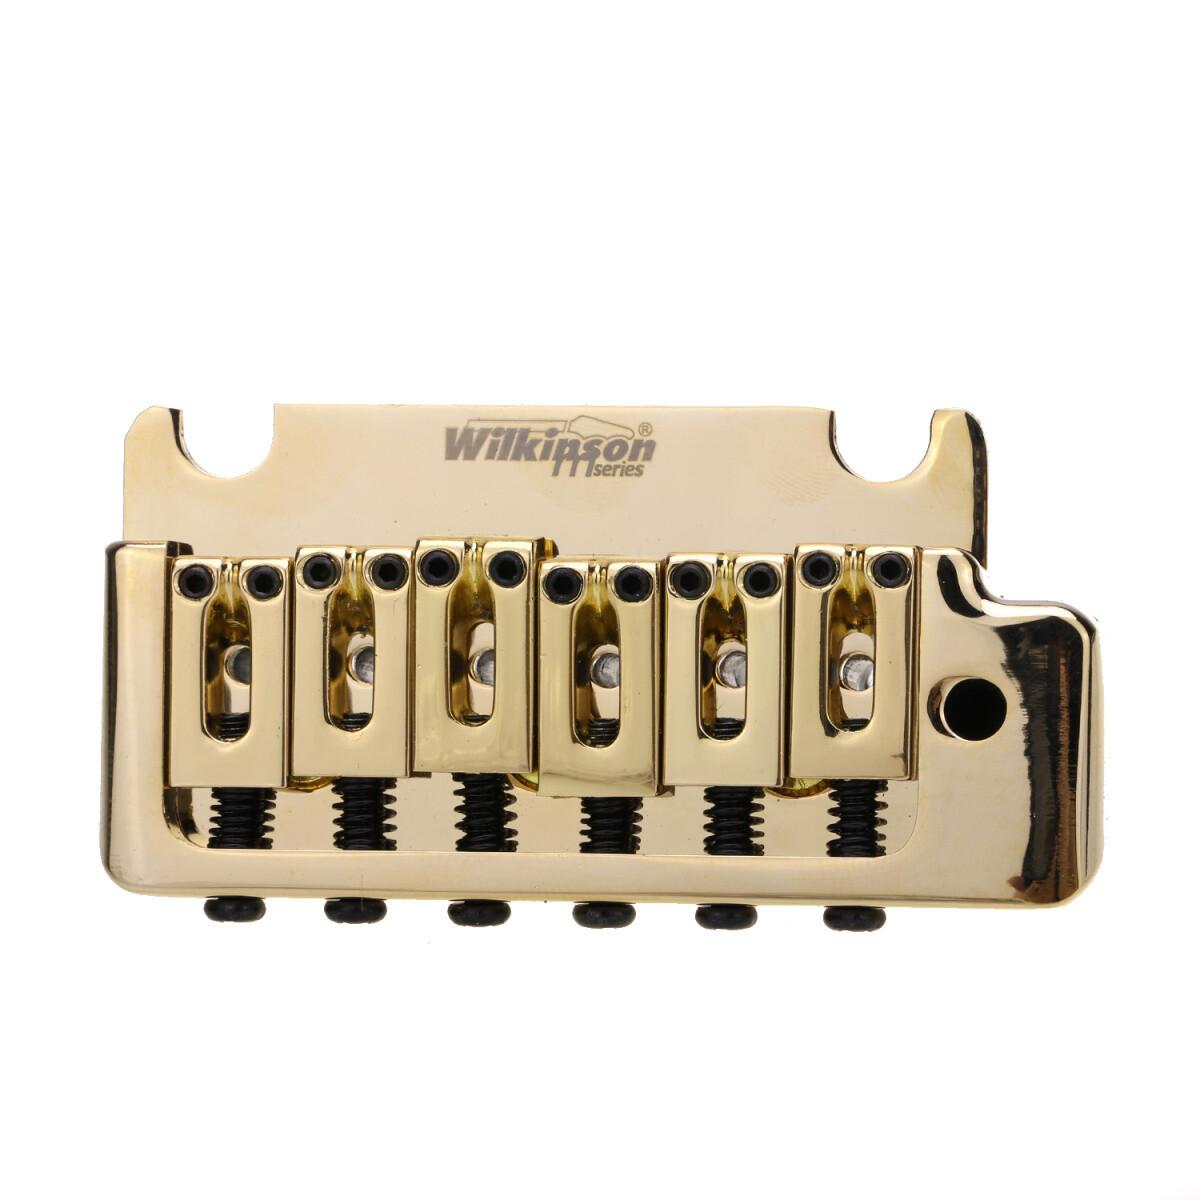 Wilkinson 52.5mm(2-1/16 inch) Full Block ST Guitar Tremolo Bridge Pop-In Arm 2-Point for American Standard or Professional Fender Strat, Gold